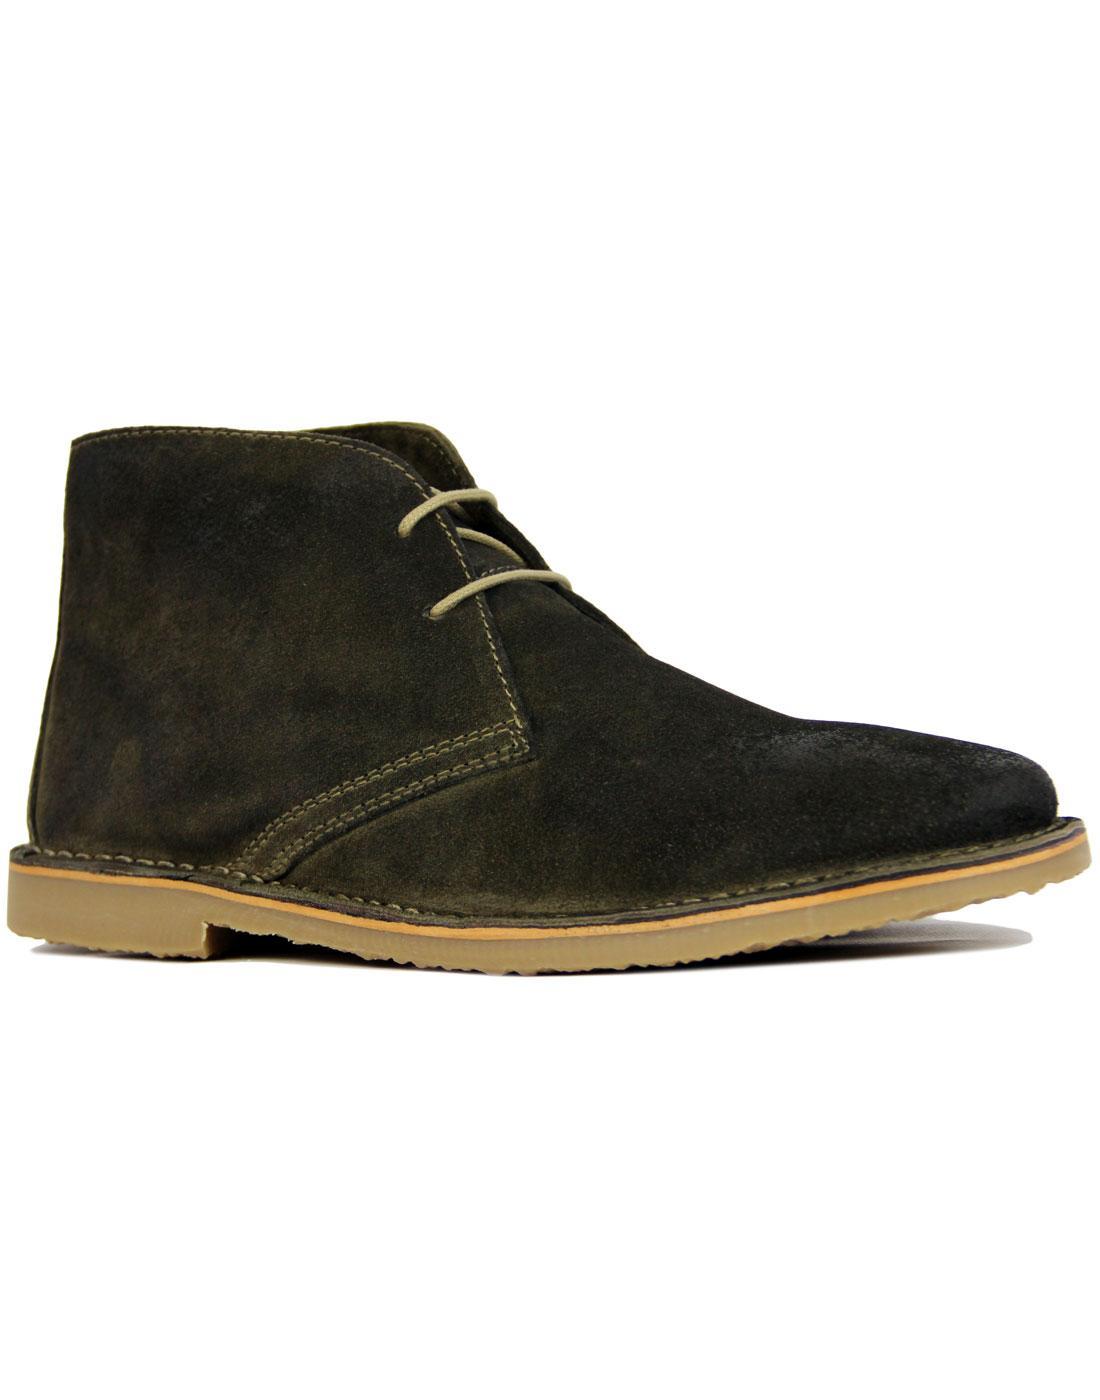 Canyon IKON ORIGINAL 60s Mod Suede Desert Boots K